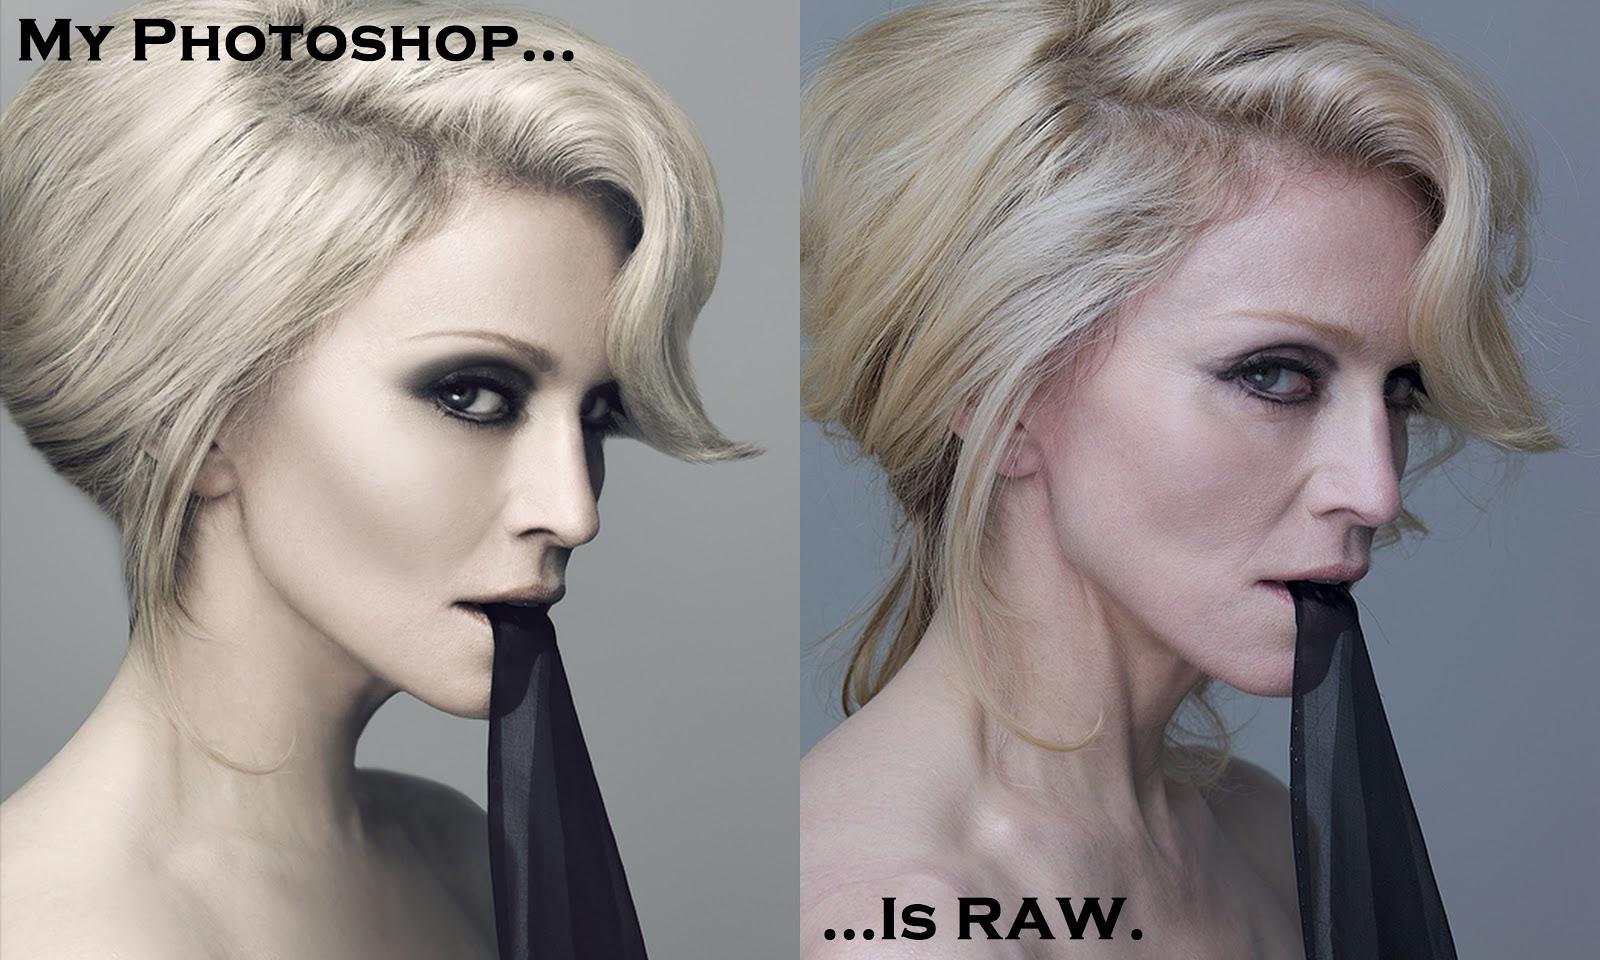 http://3.bp.blogspot.com/_v7Yr_VRvOK0/TMvS-FN82HI/AAAAAAAAA2w/fxNfSCwbzls/s1600/Madonna.jpg